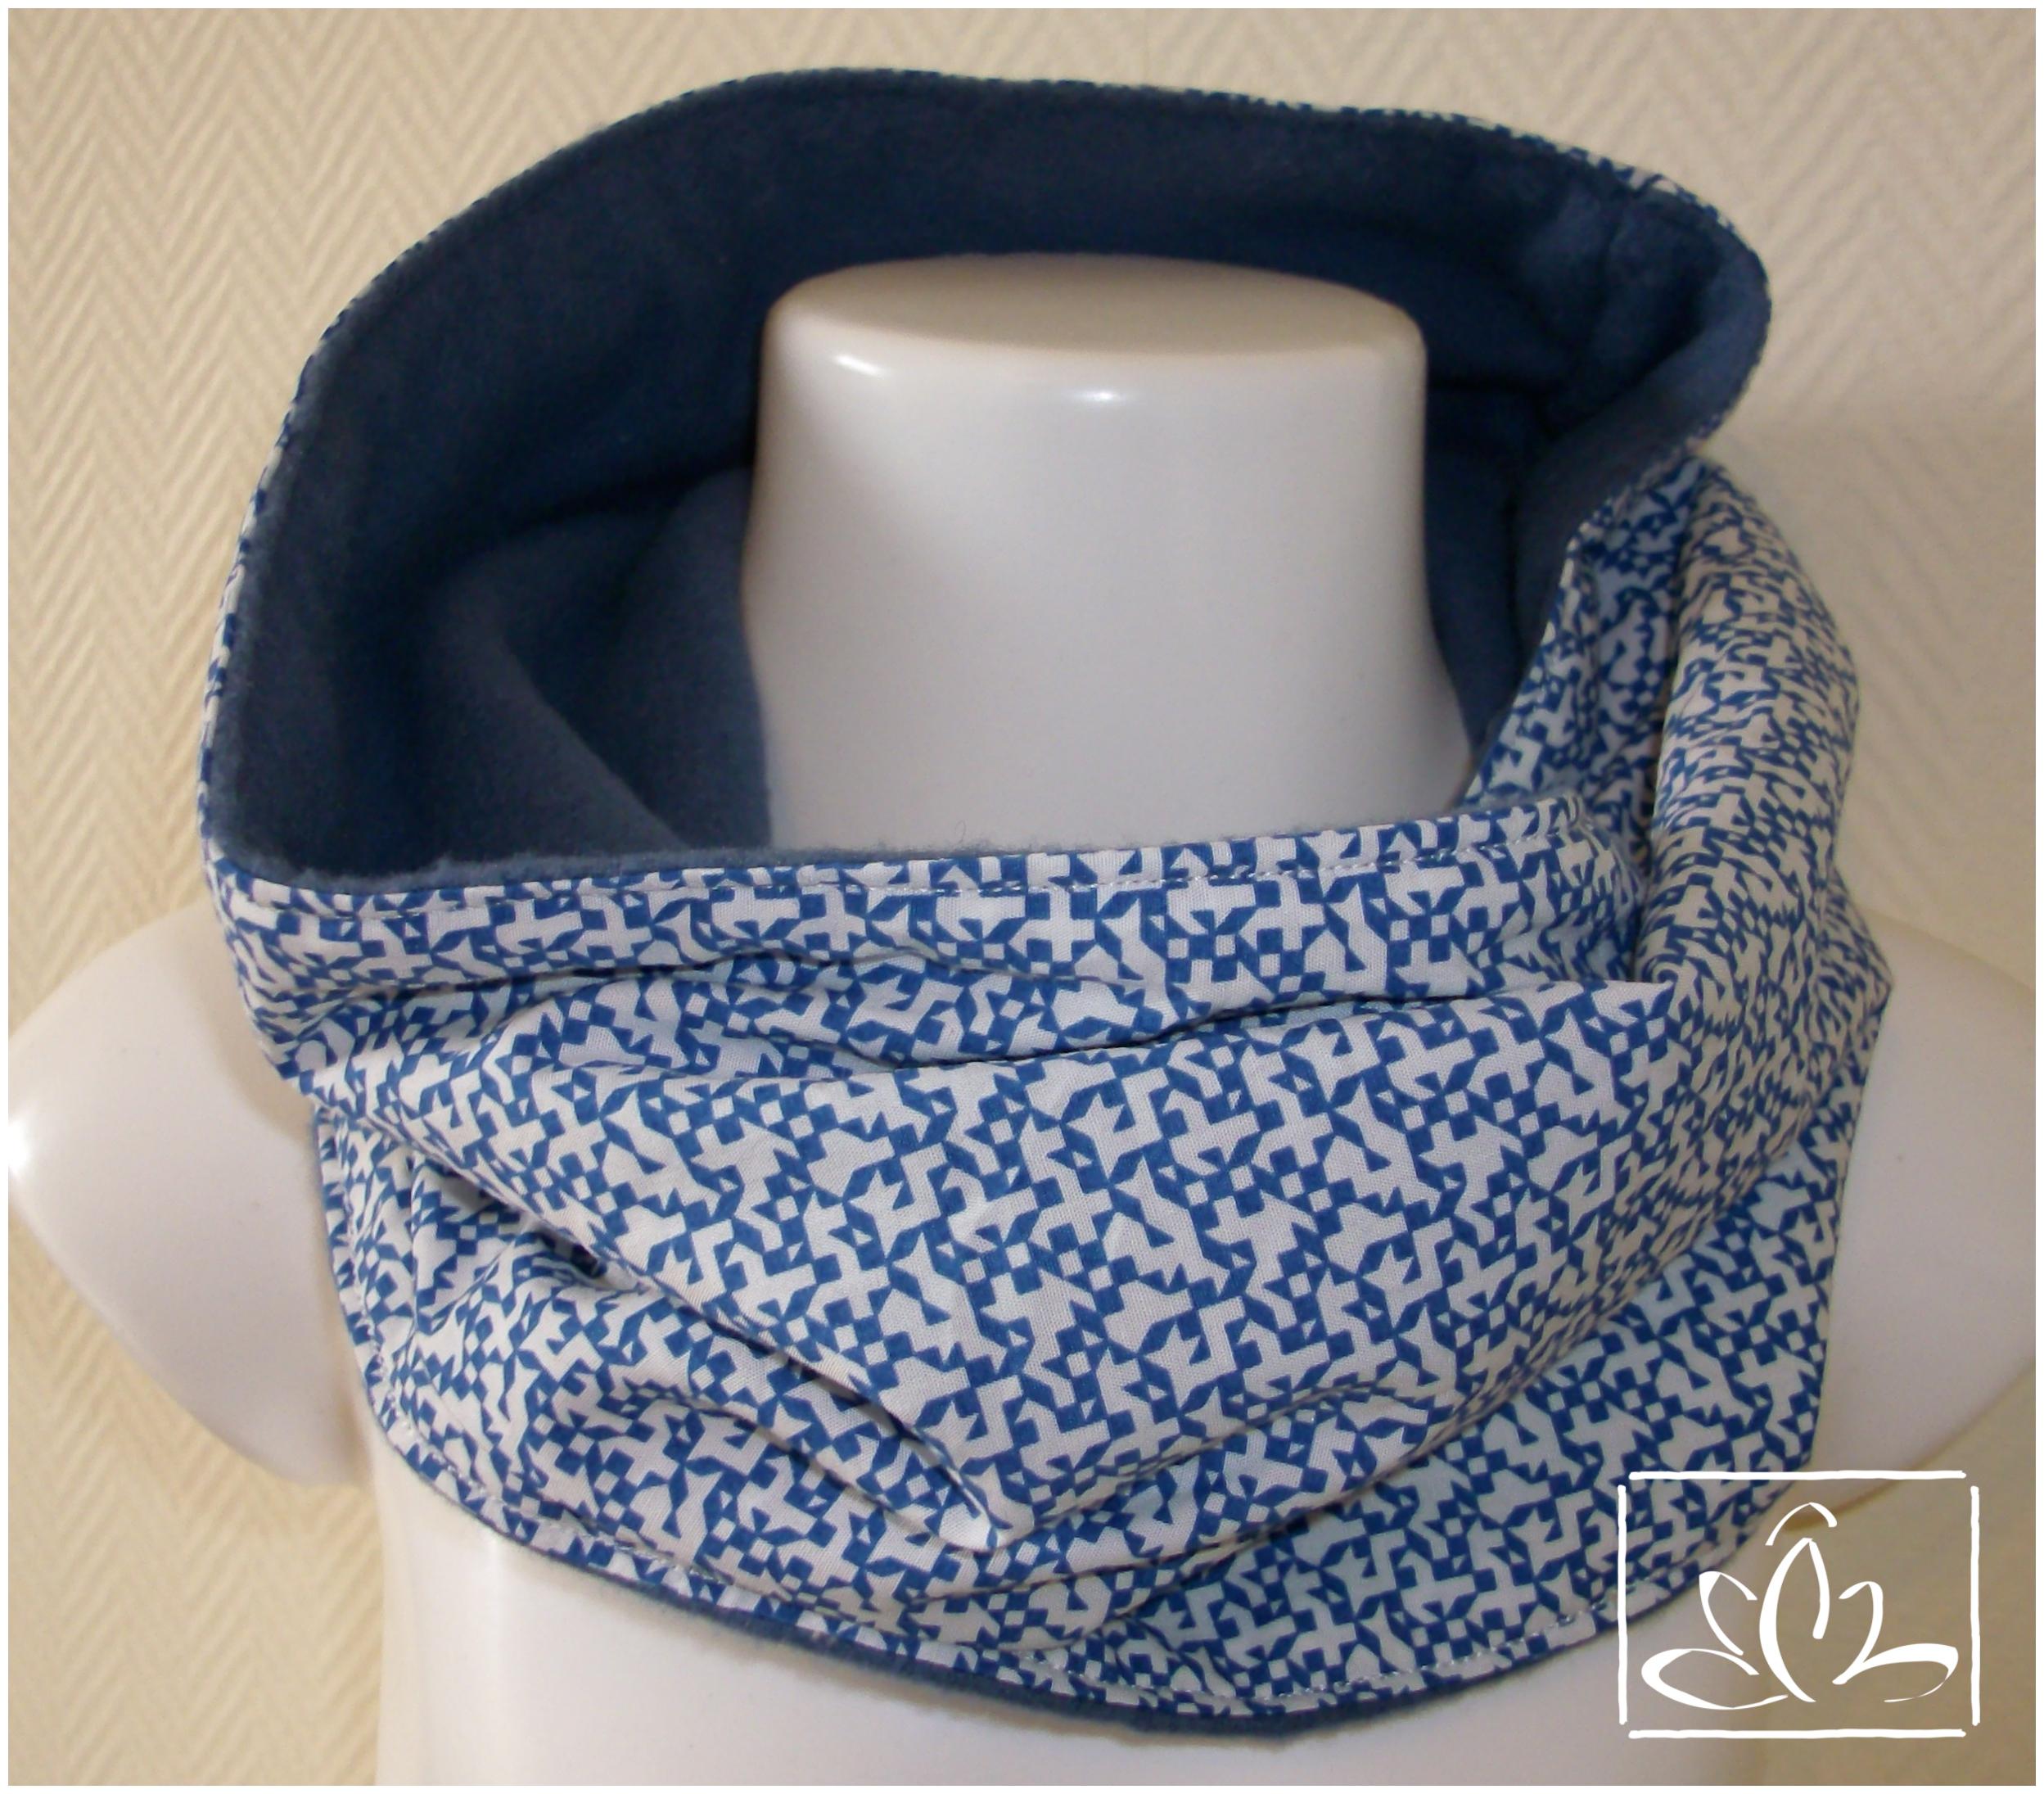 da41ca947e5f4 Tour de cou – Snood – tissu blanc et bleu effet pixel / polaire bleu – 2/5  ans